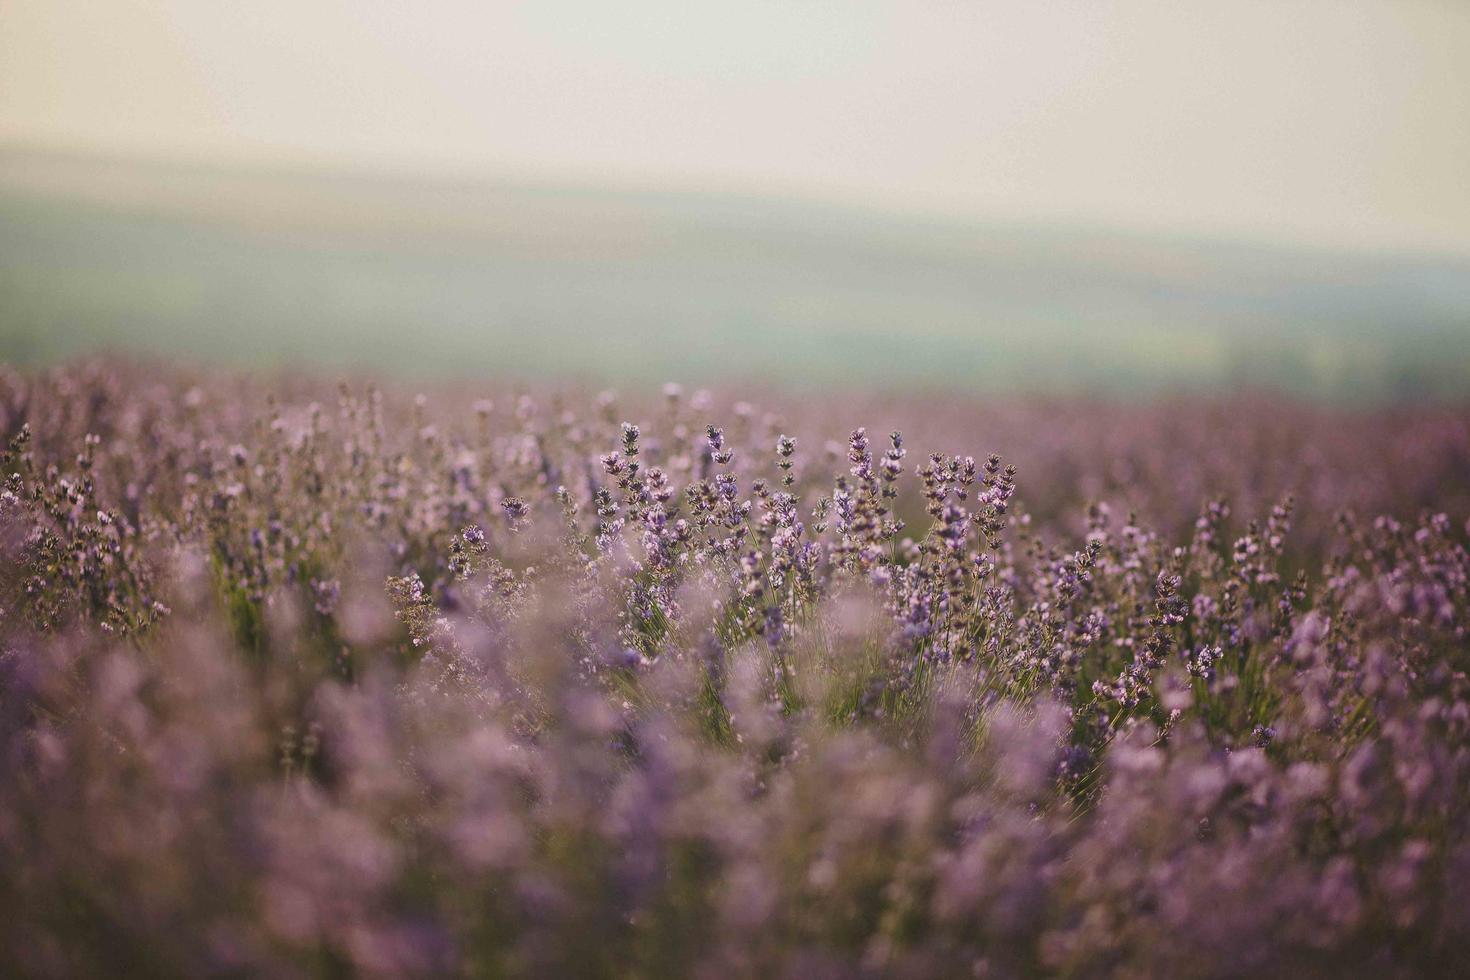 lavendel blomma fält foto